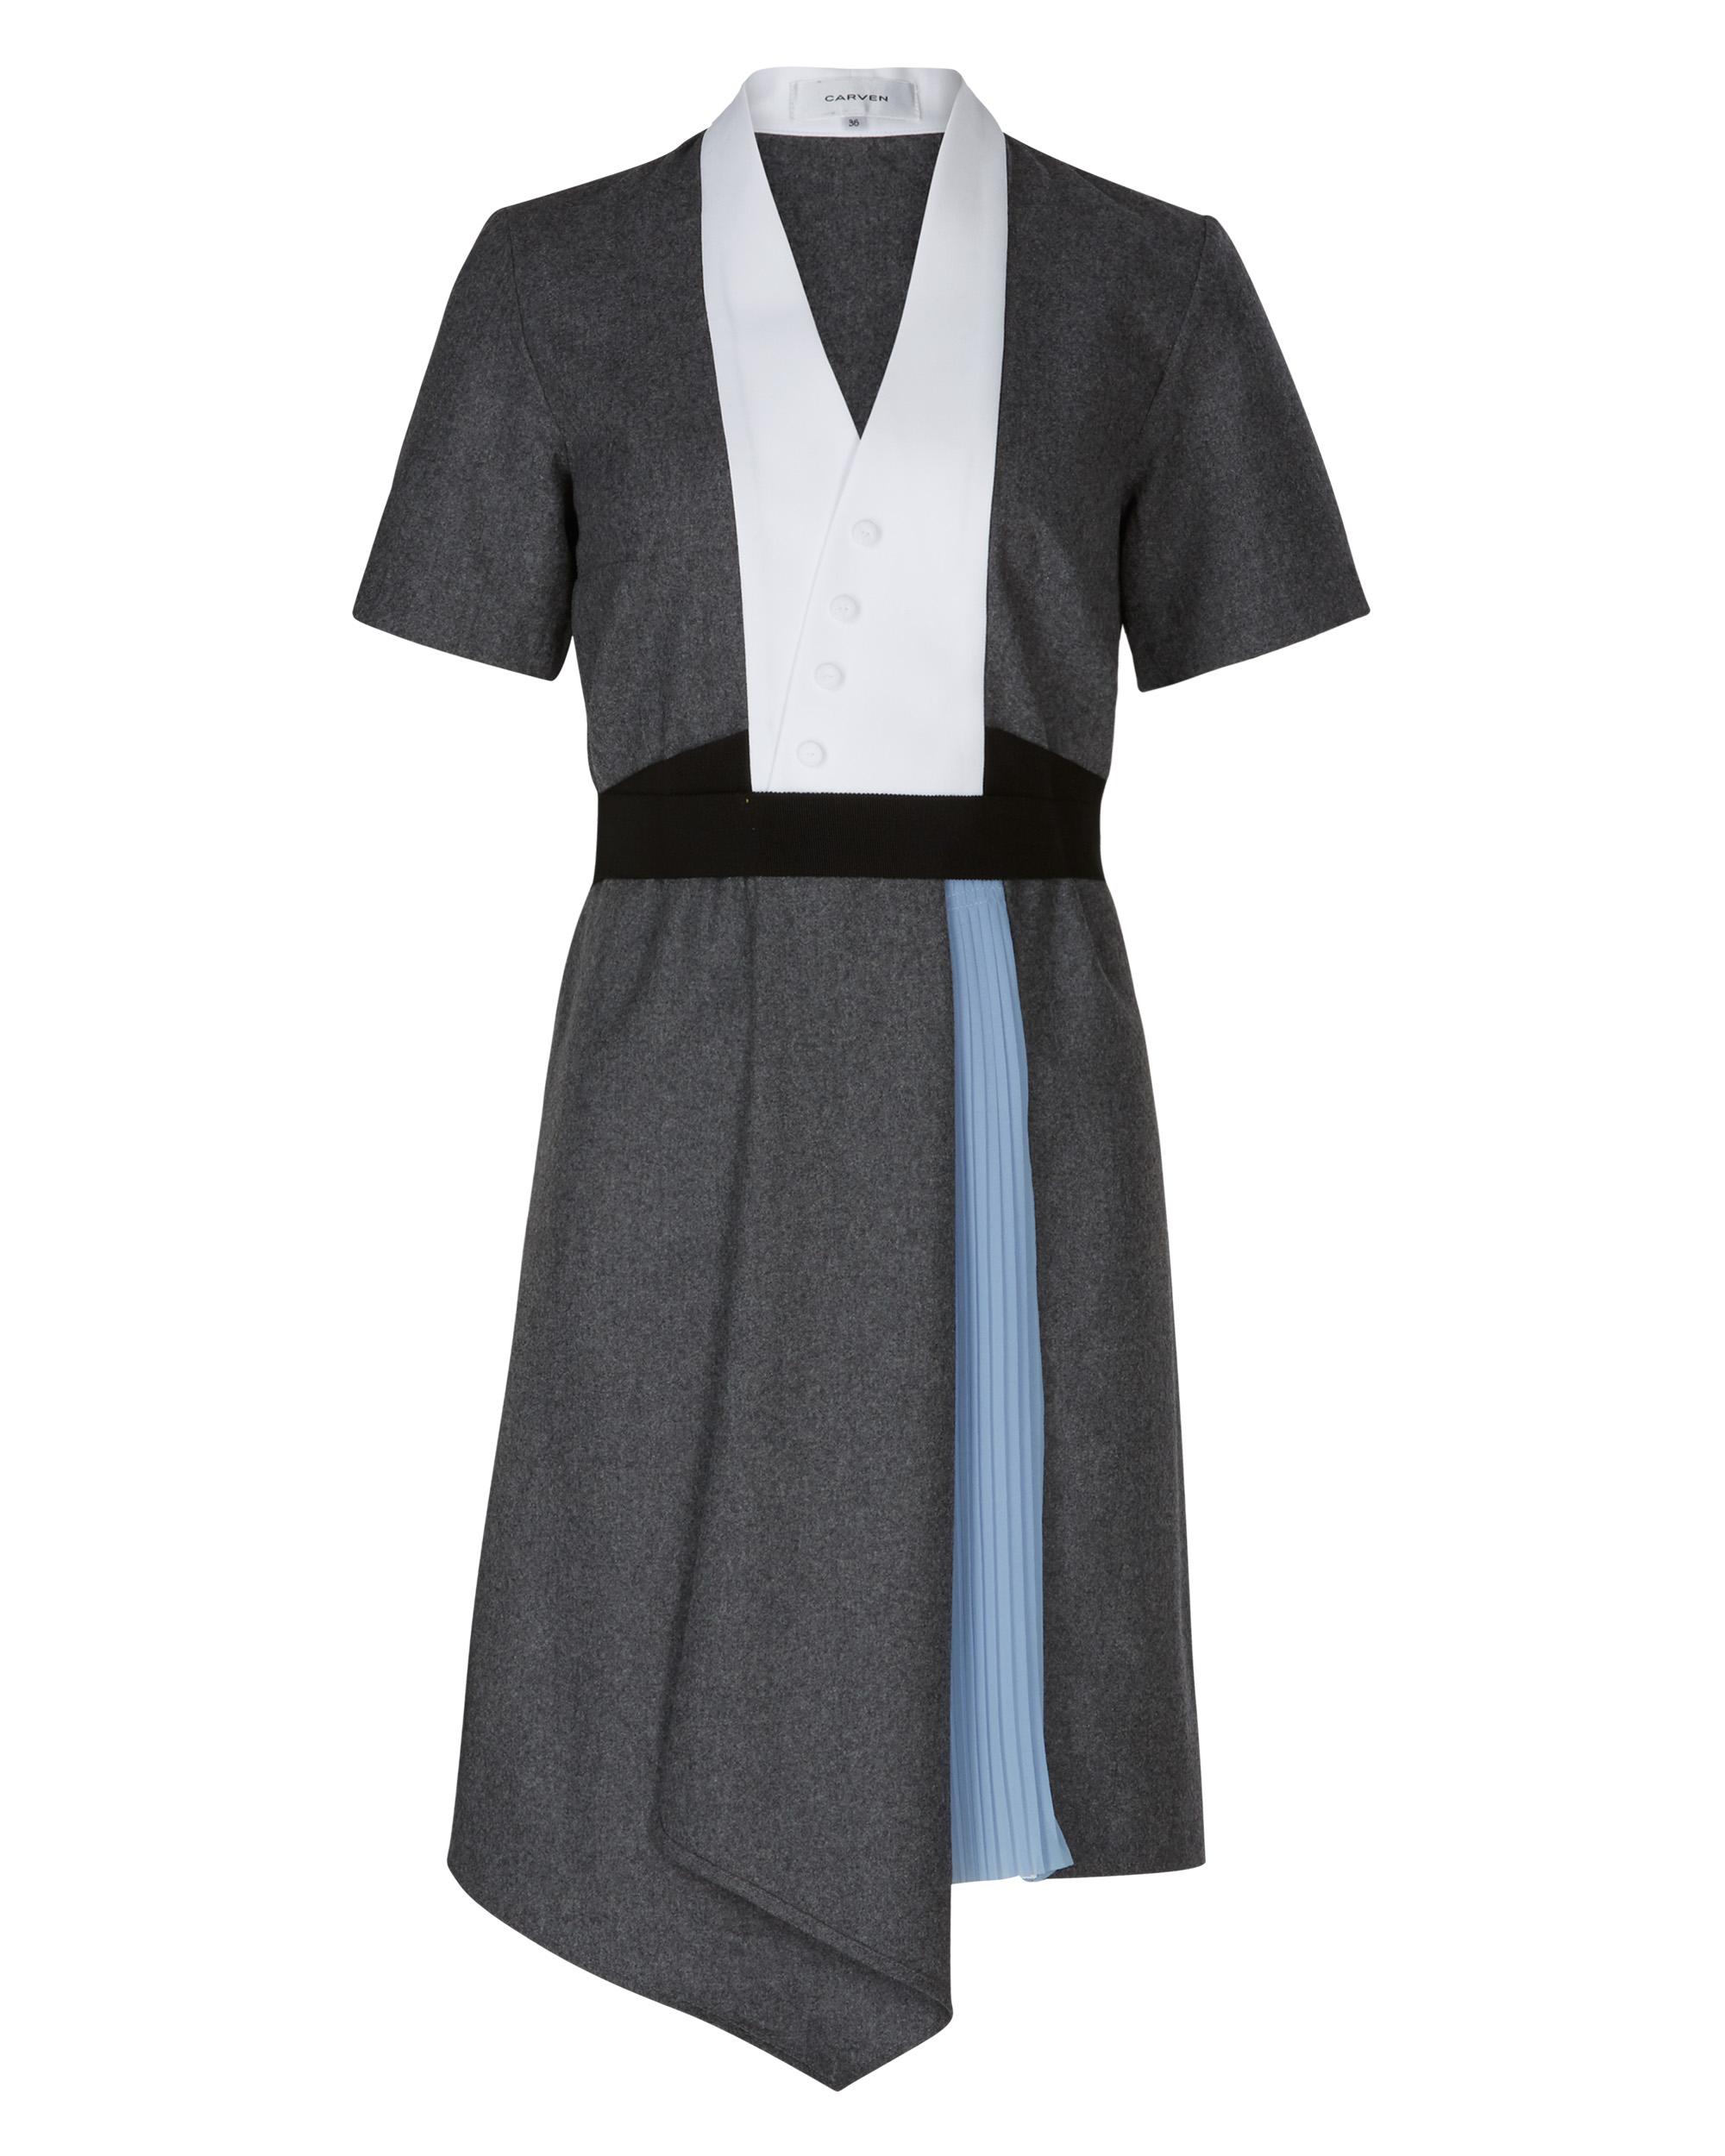 Trouva Carven Flannel Wrap Dress : hbosnja5dsholgfgpkqo from www.trouva.com size 2000 x 2500 jpeg 506kB